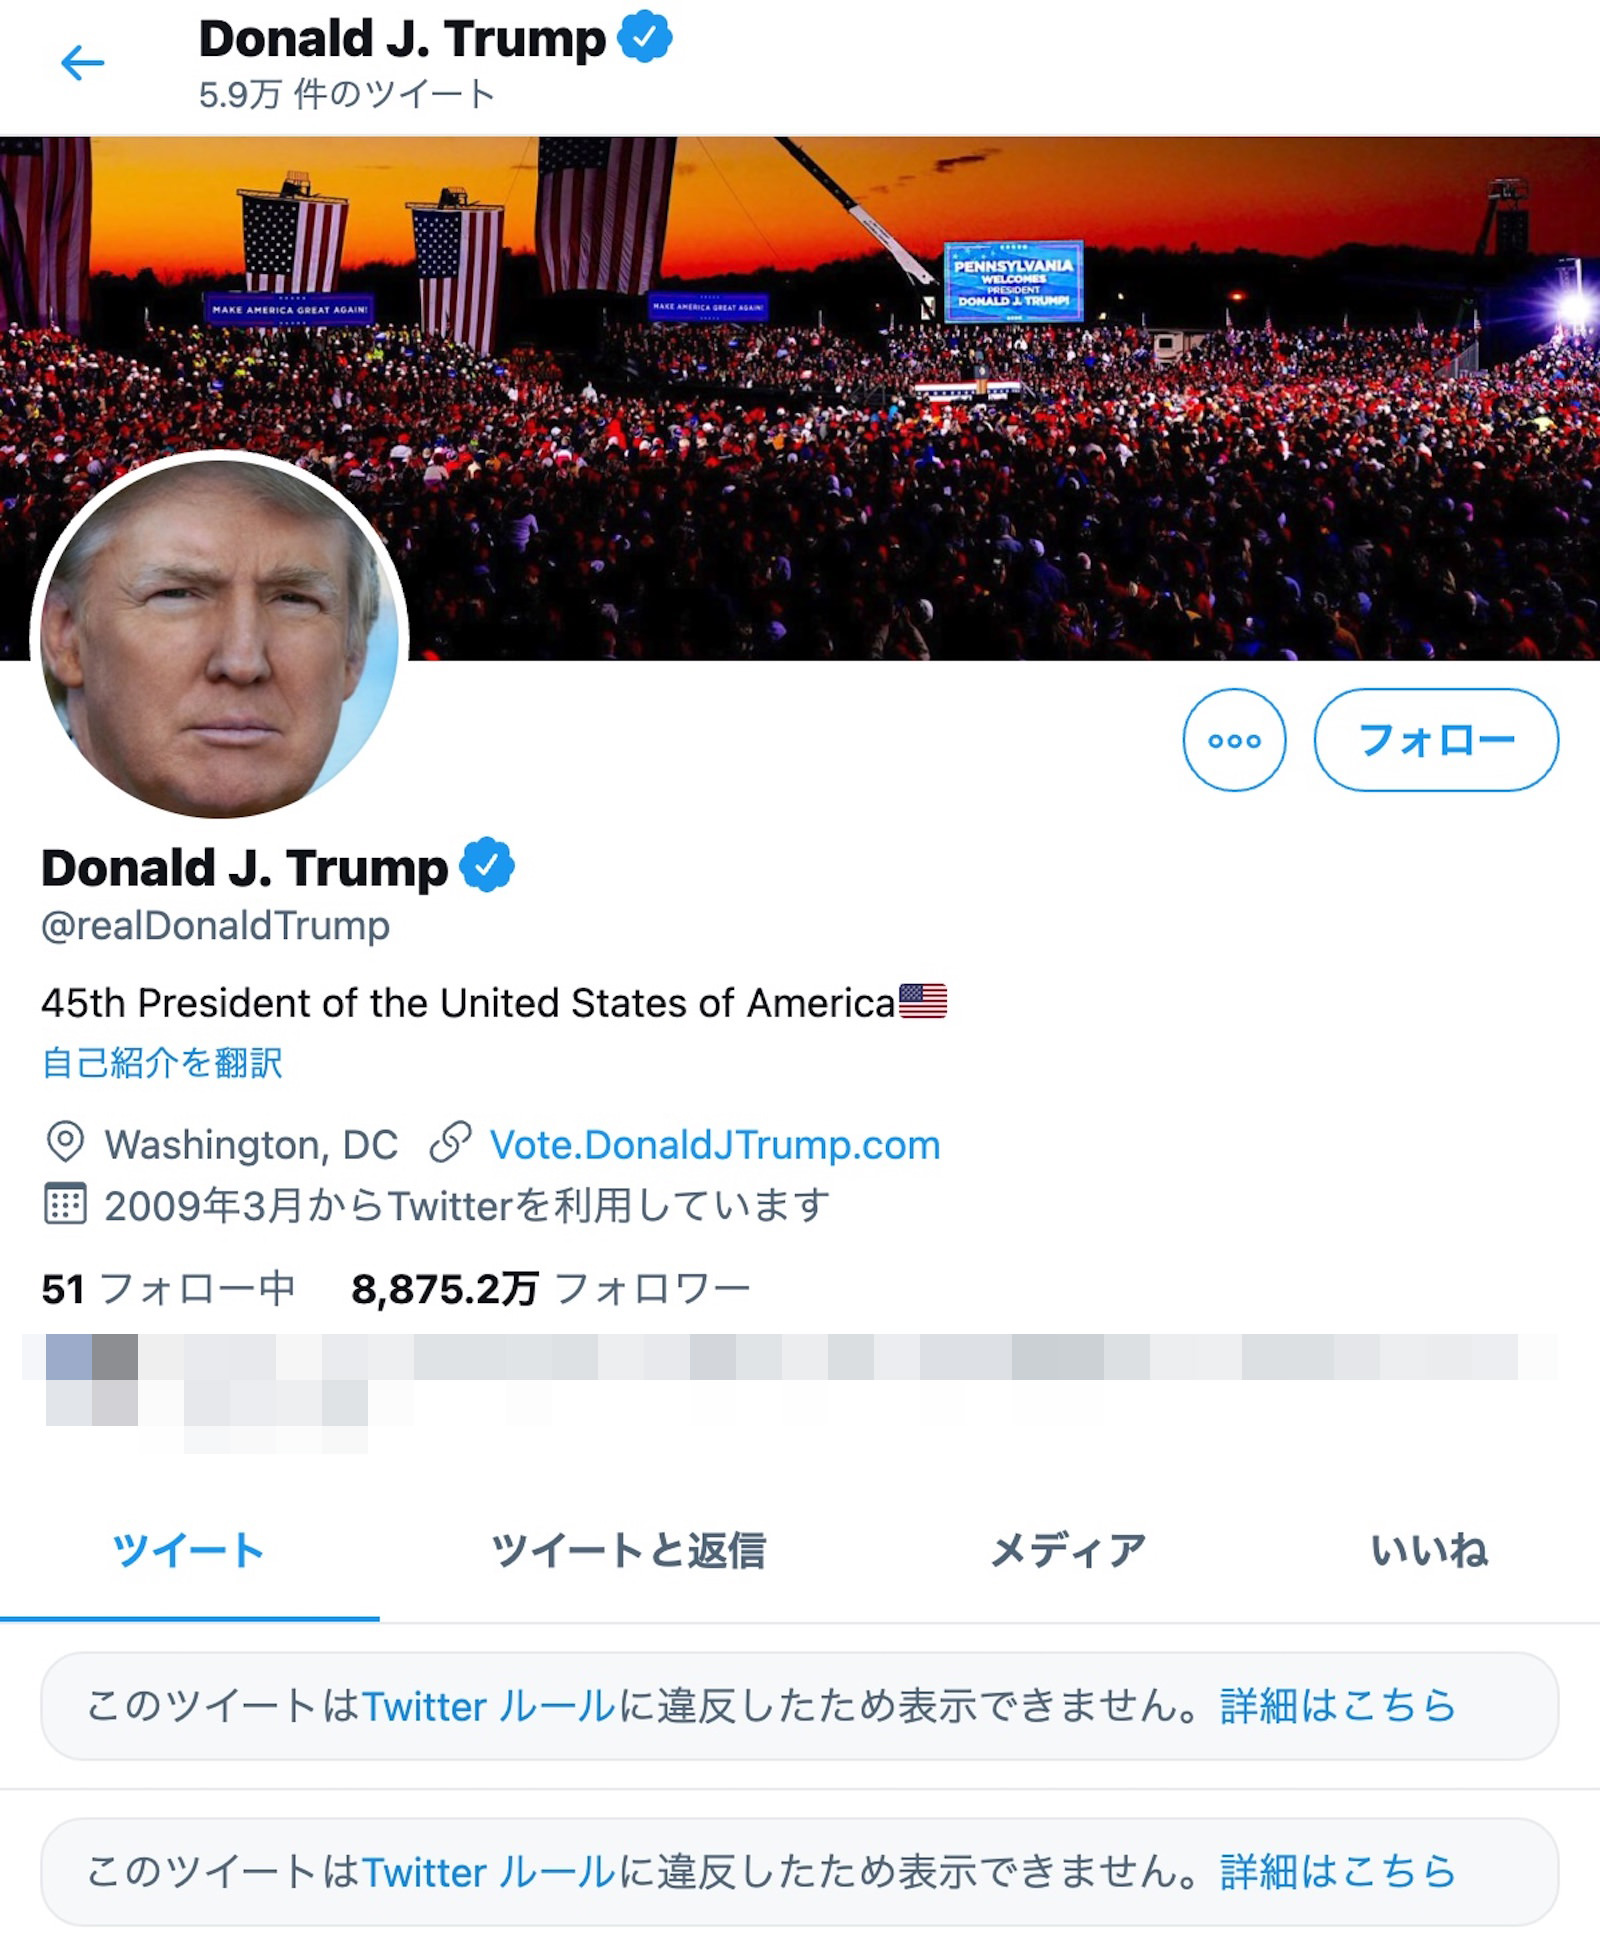 Trump terminated tweets risk or losing account 2